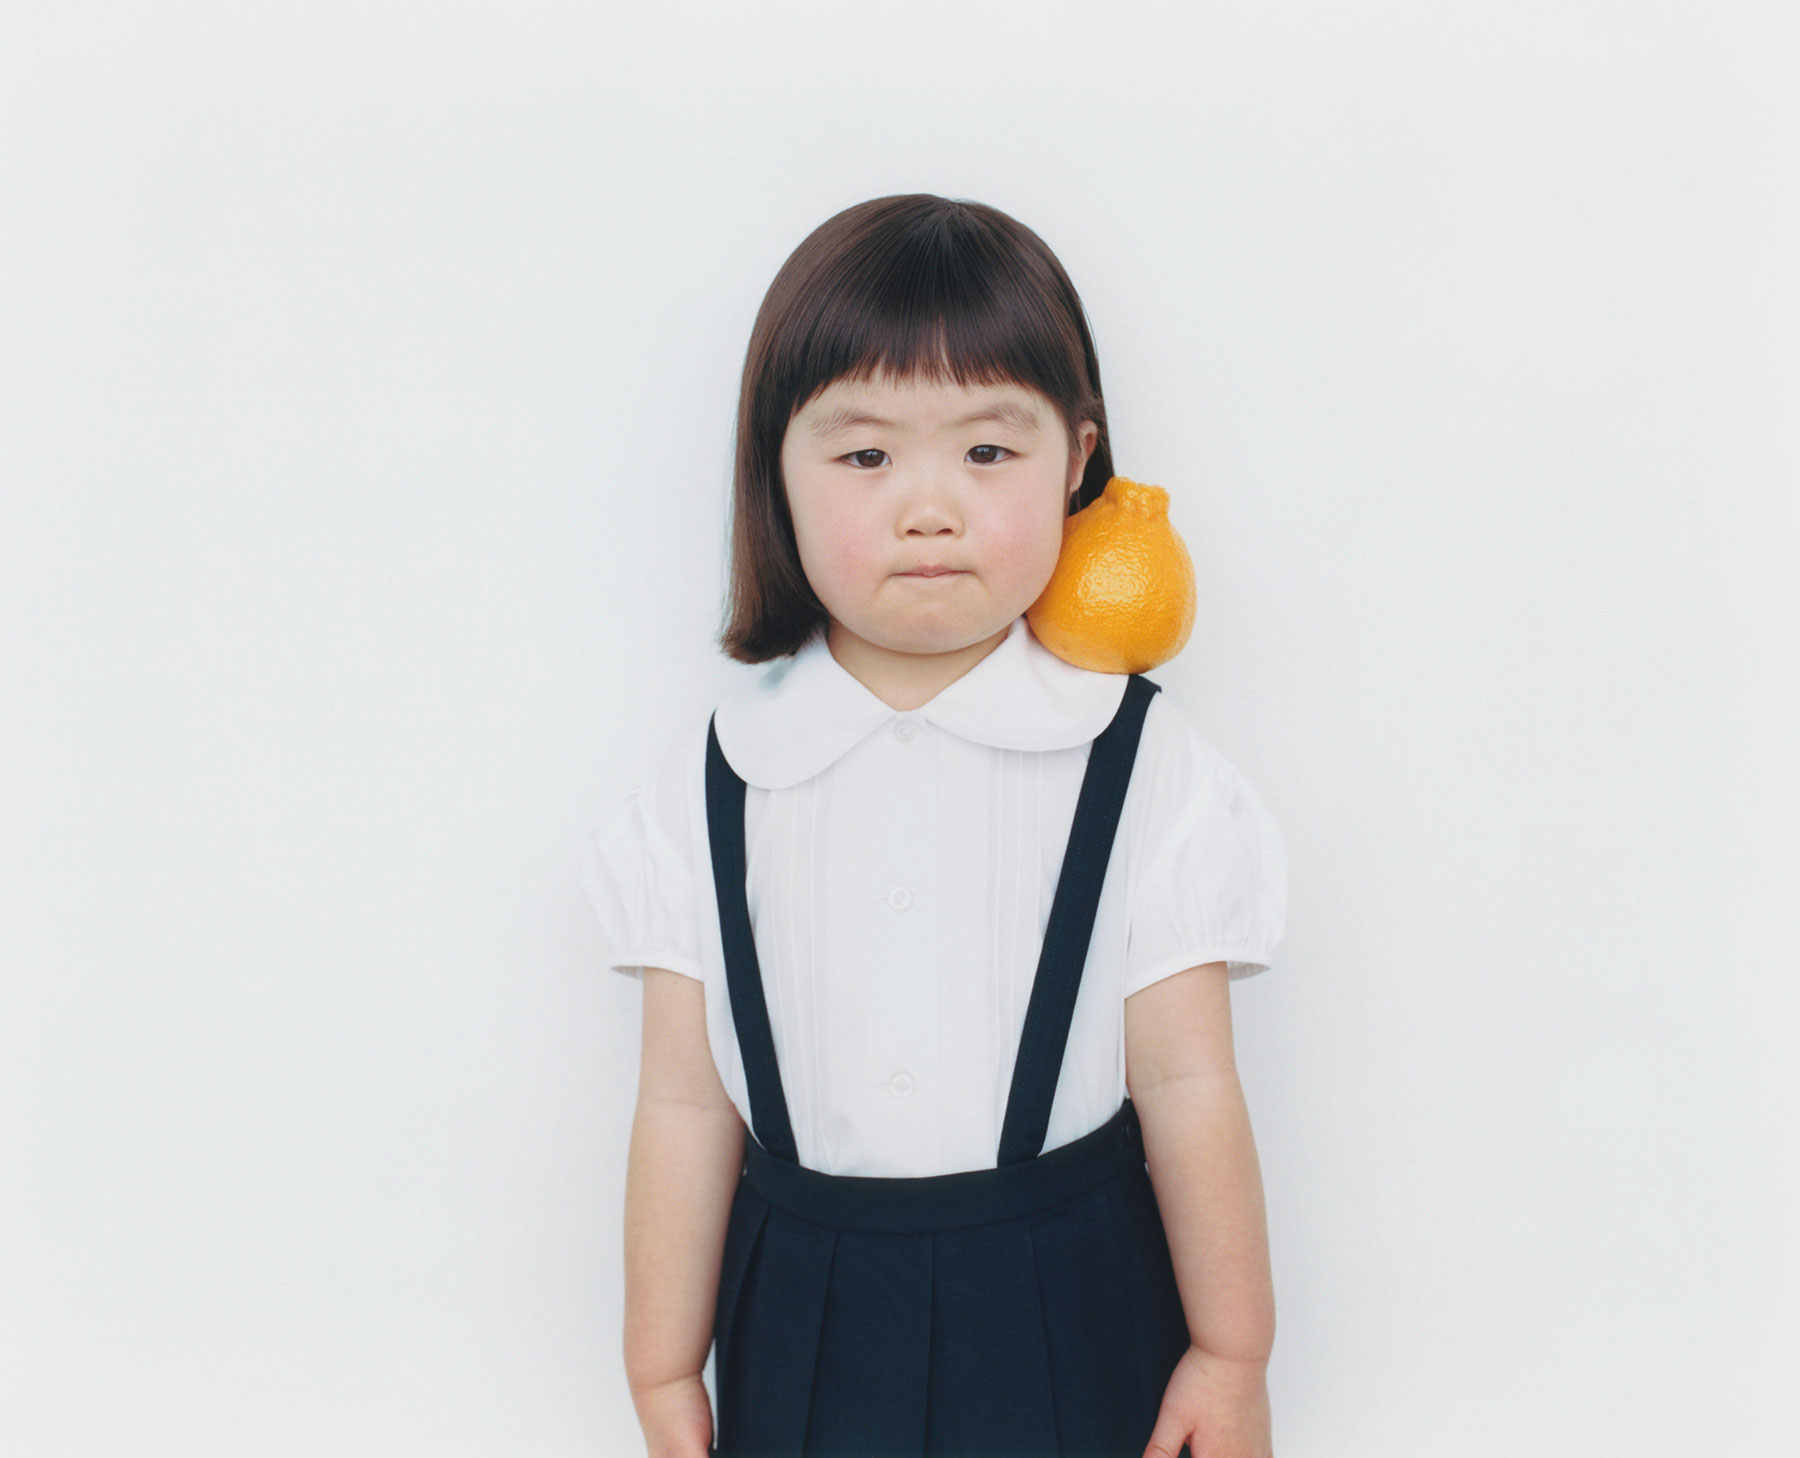 Osamu Yokonami,  1000 Children: Sumo Mandarin No. 16 , 2010-2013  Digital pigment print, 895 x 1105 mm (approx. 34.25 x 43.5 in), edition of 5; 146 x 168 mm (approx. 5.75 x 6.6 in), edition of 10   Inquire